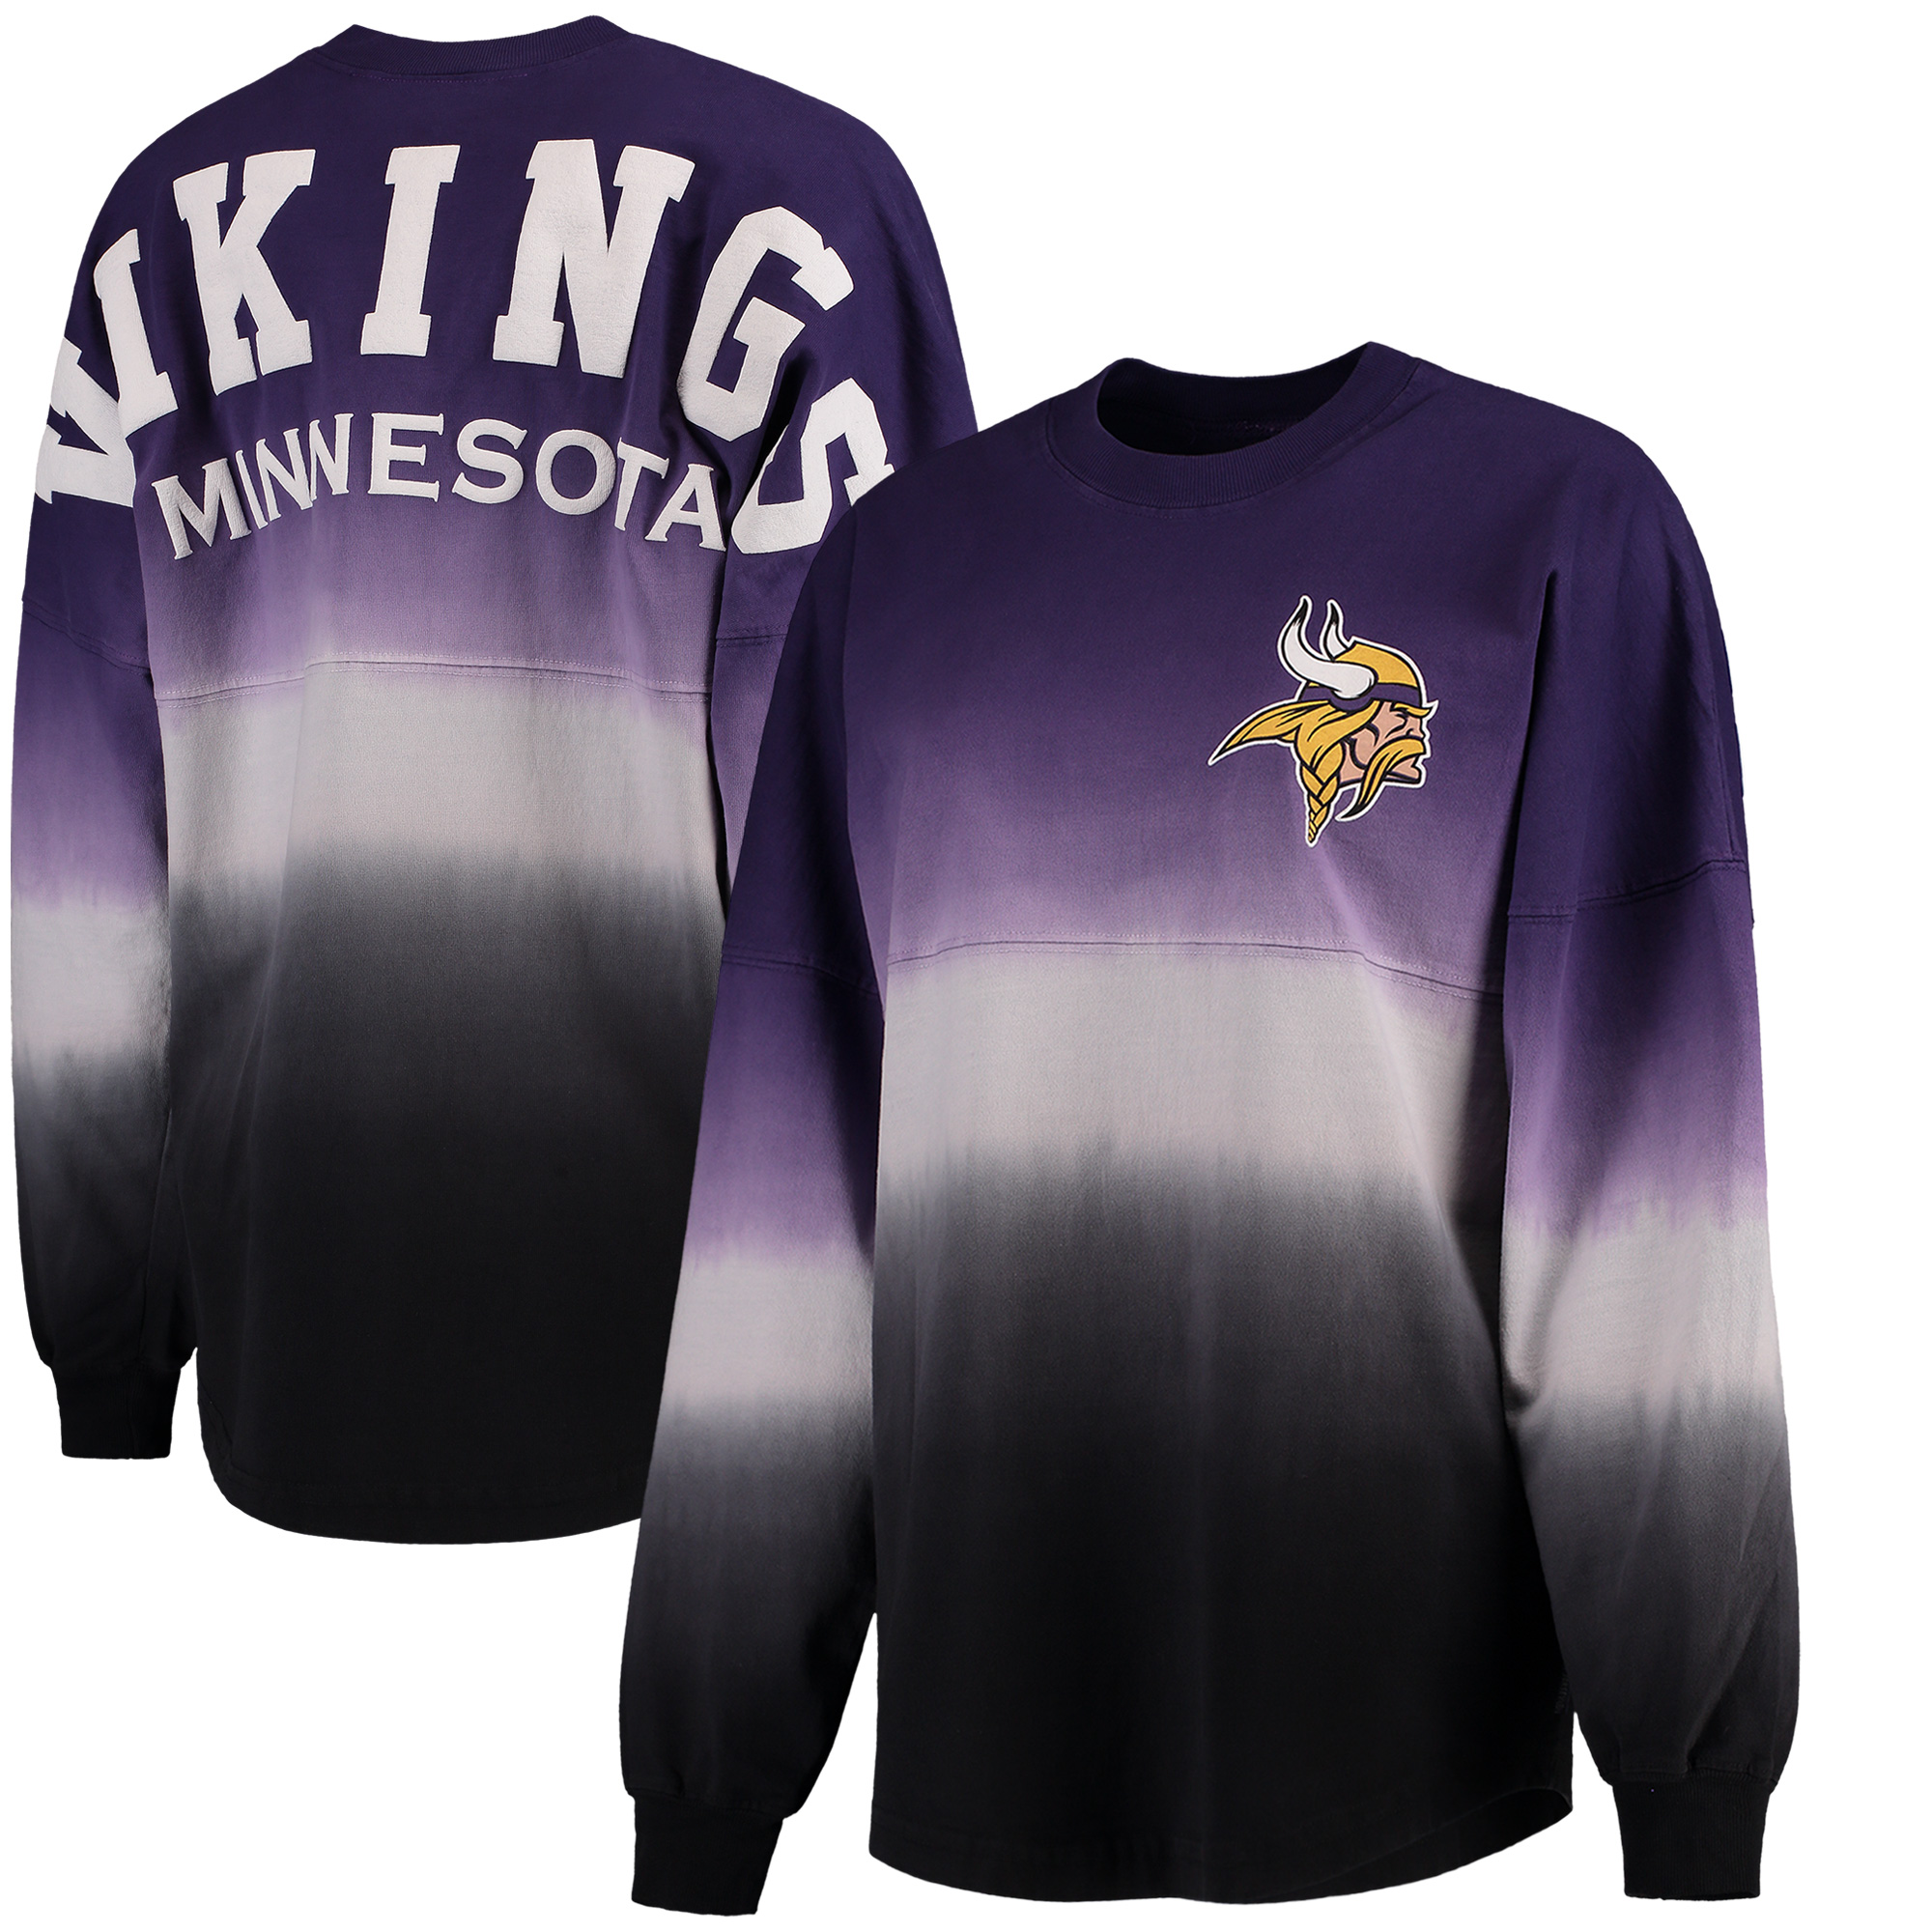 Minnesota Vikings NFL Pro Line by Fanatics Branded Women's Spirit Jersey Long Sleeve T-Shirt - Purple/Black